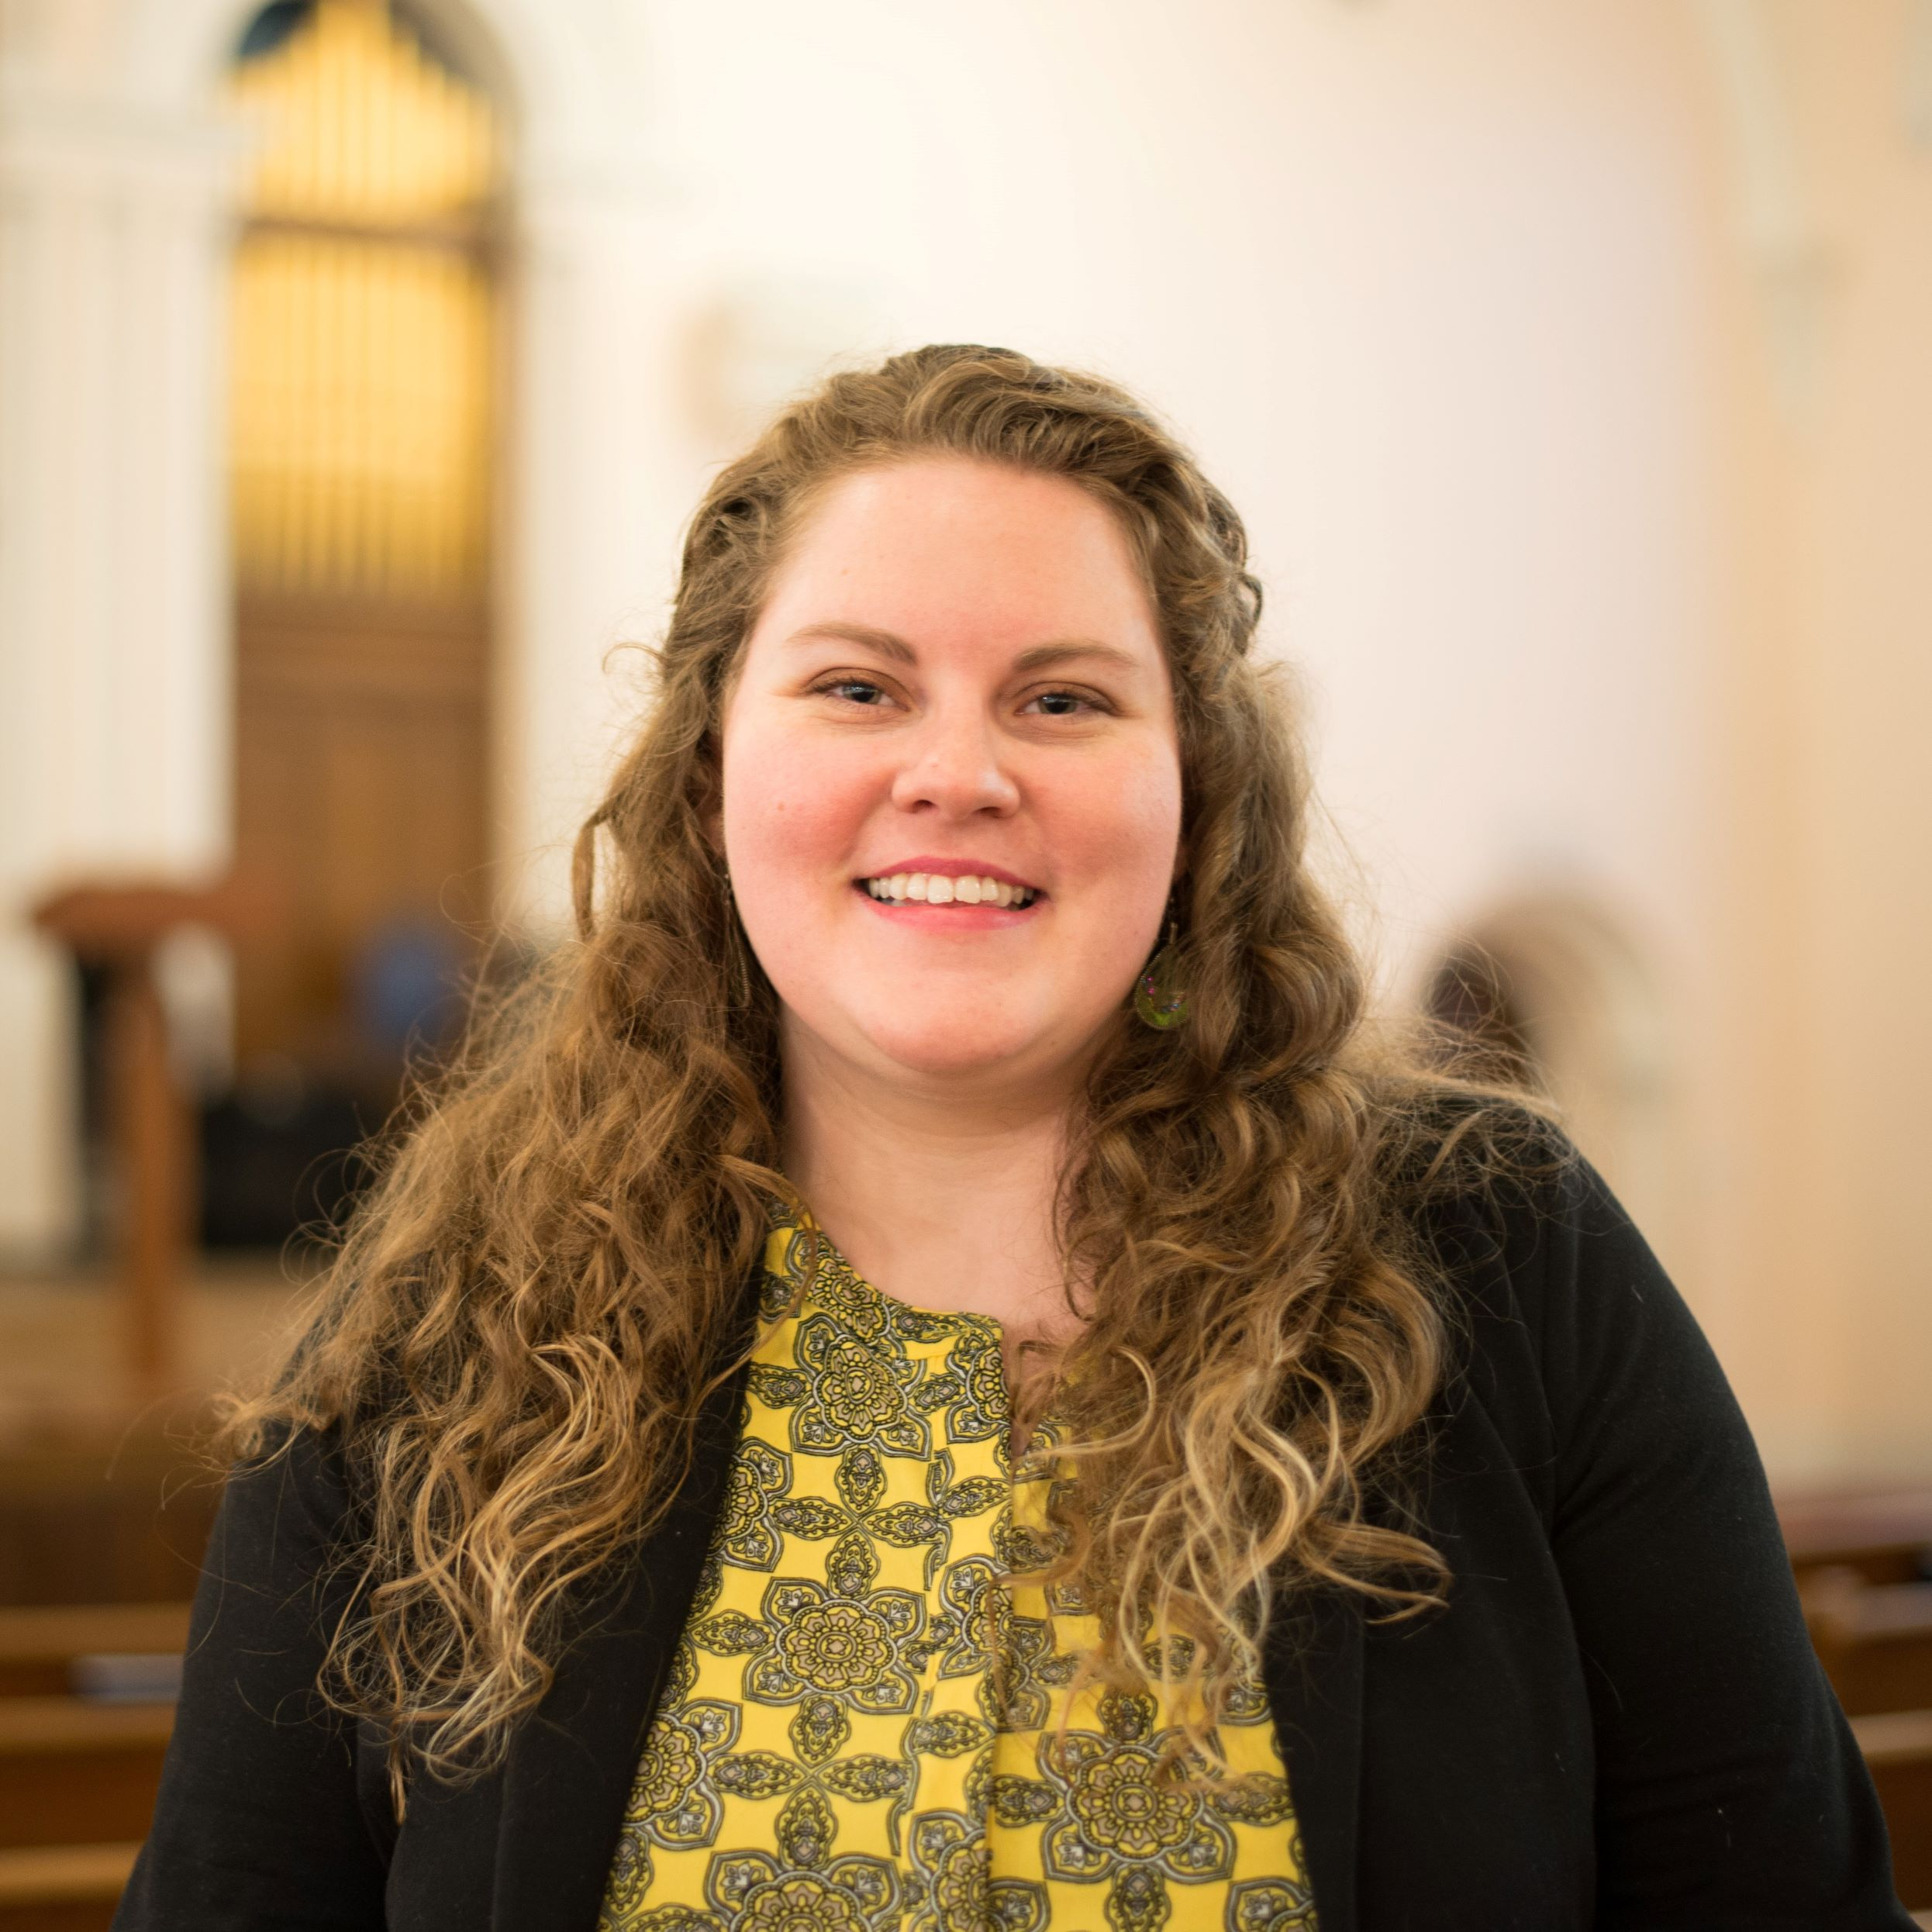 Megan Farcas, LMHC